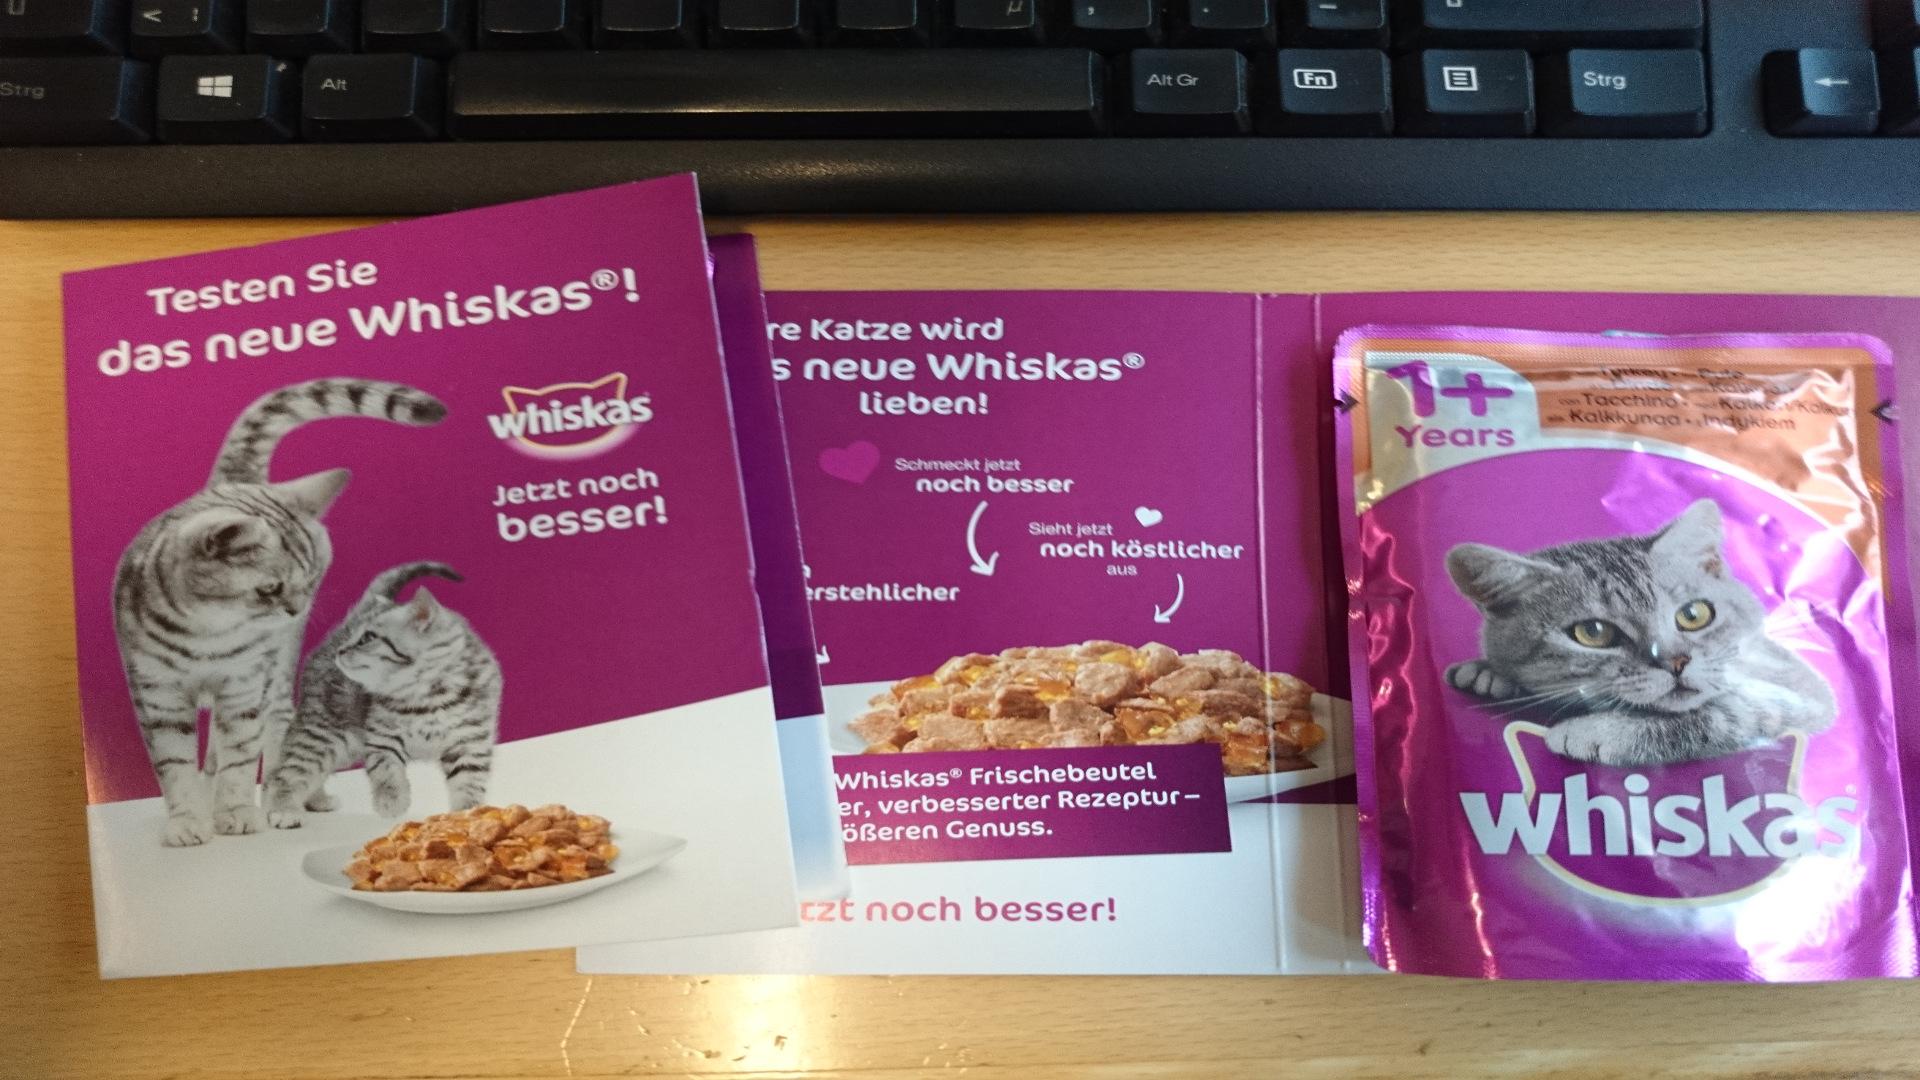 Gratis Whiskas Katzenfutterprobe in den Postfilialen